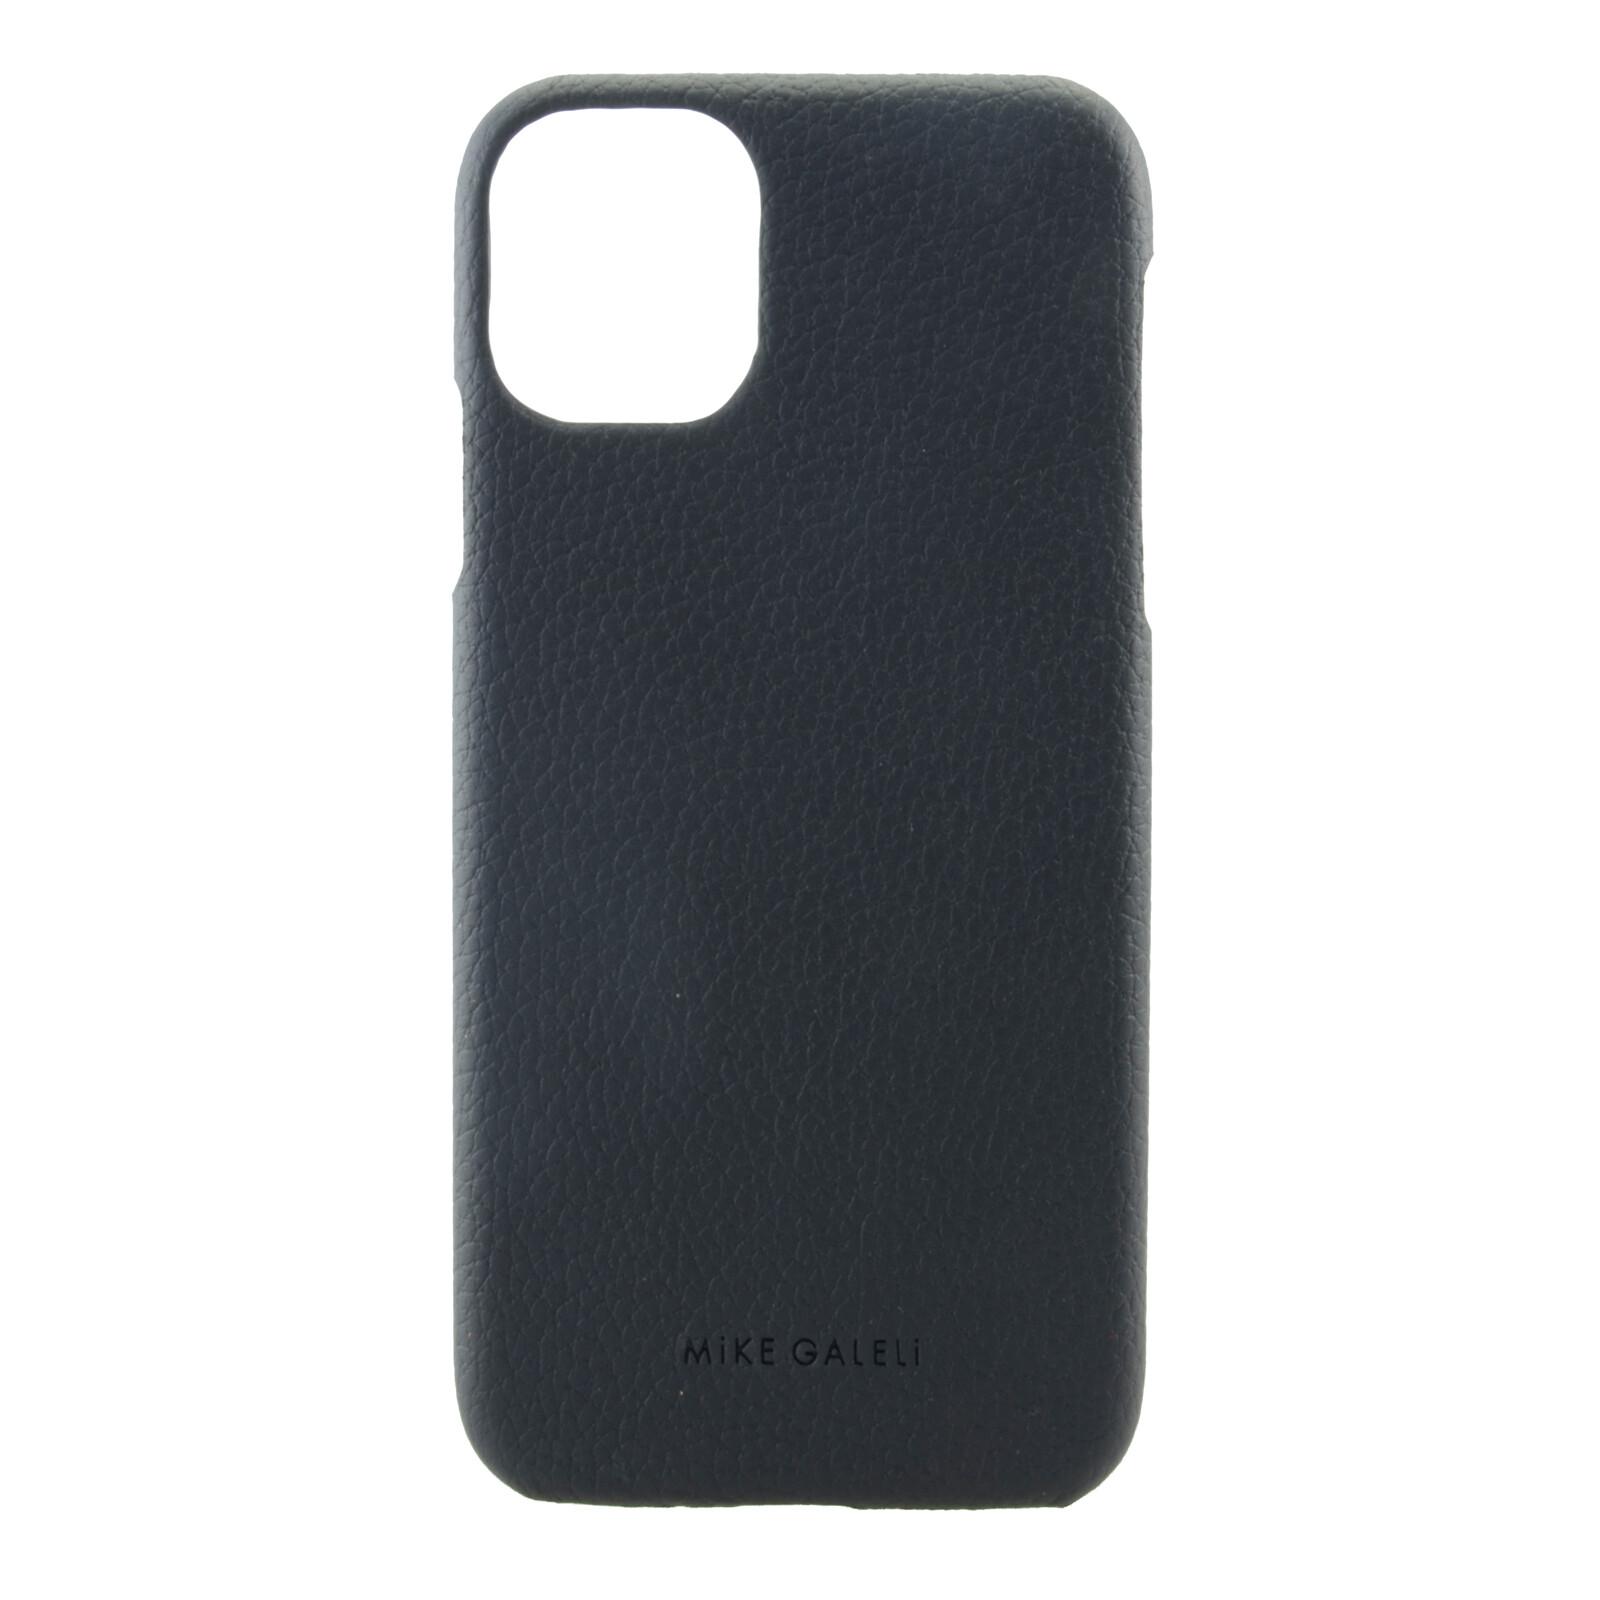 Galeli Back Case LENNY Apple iPhone 11 Pro Max